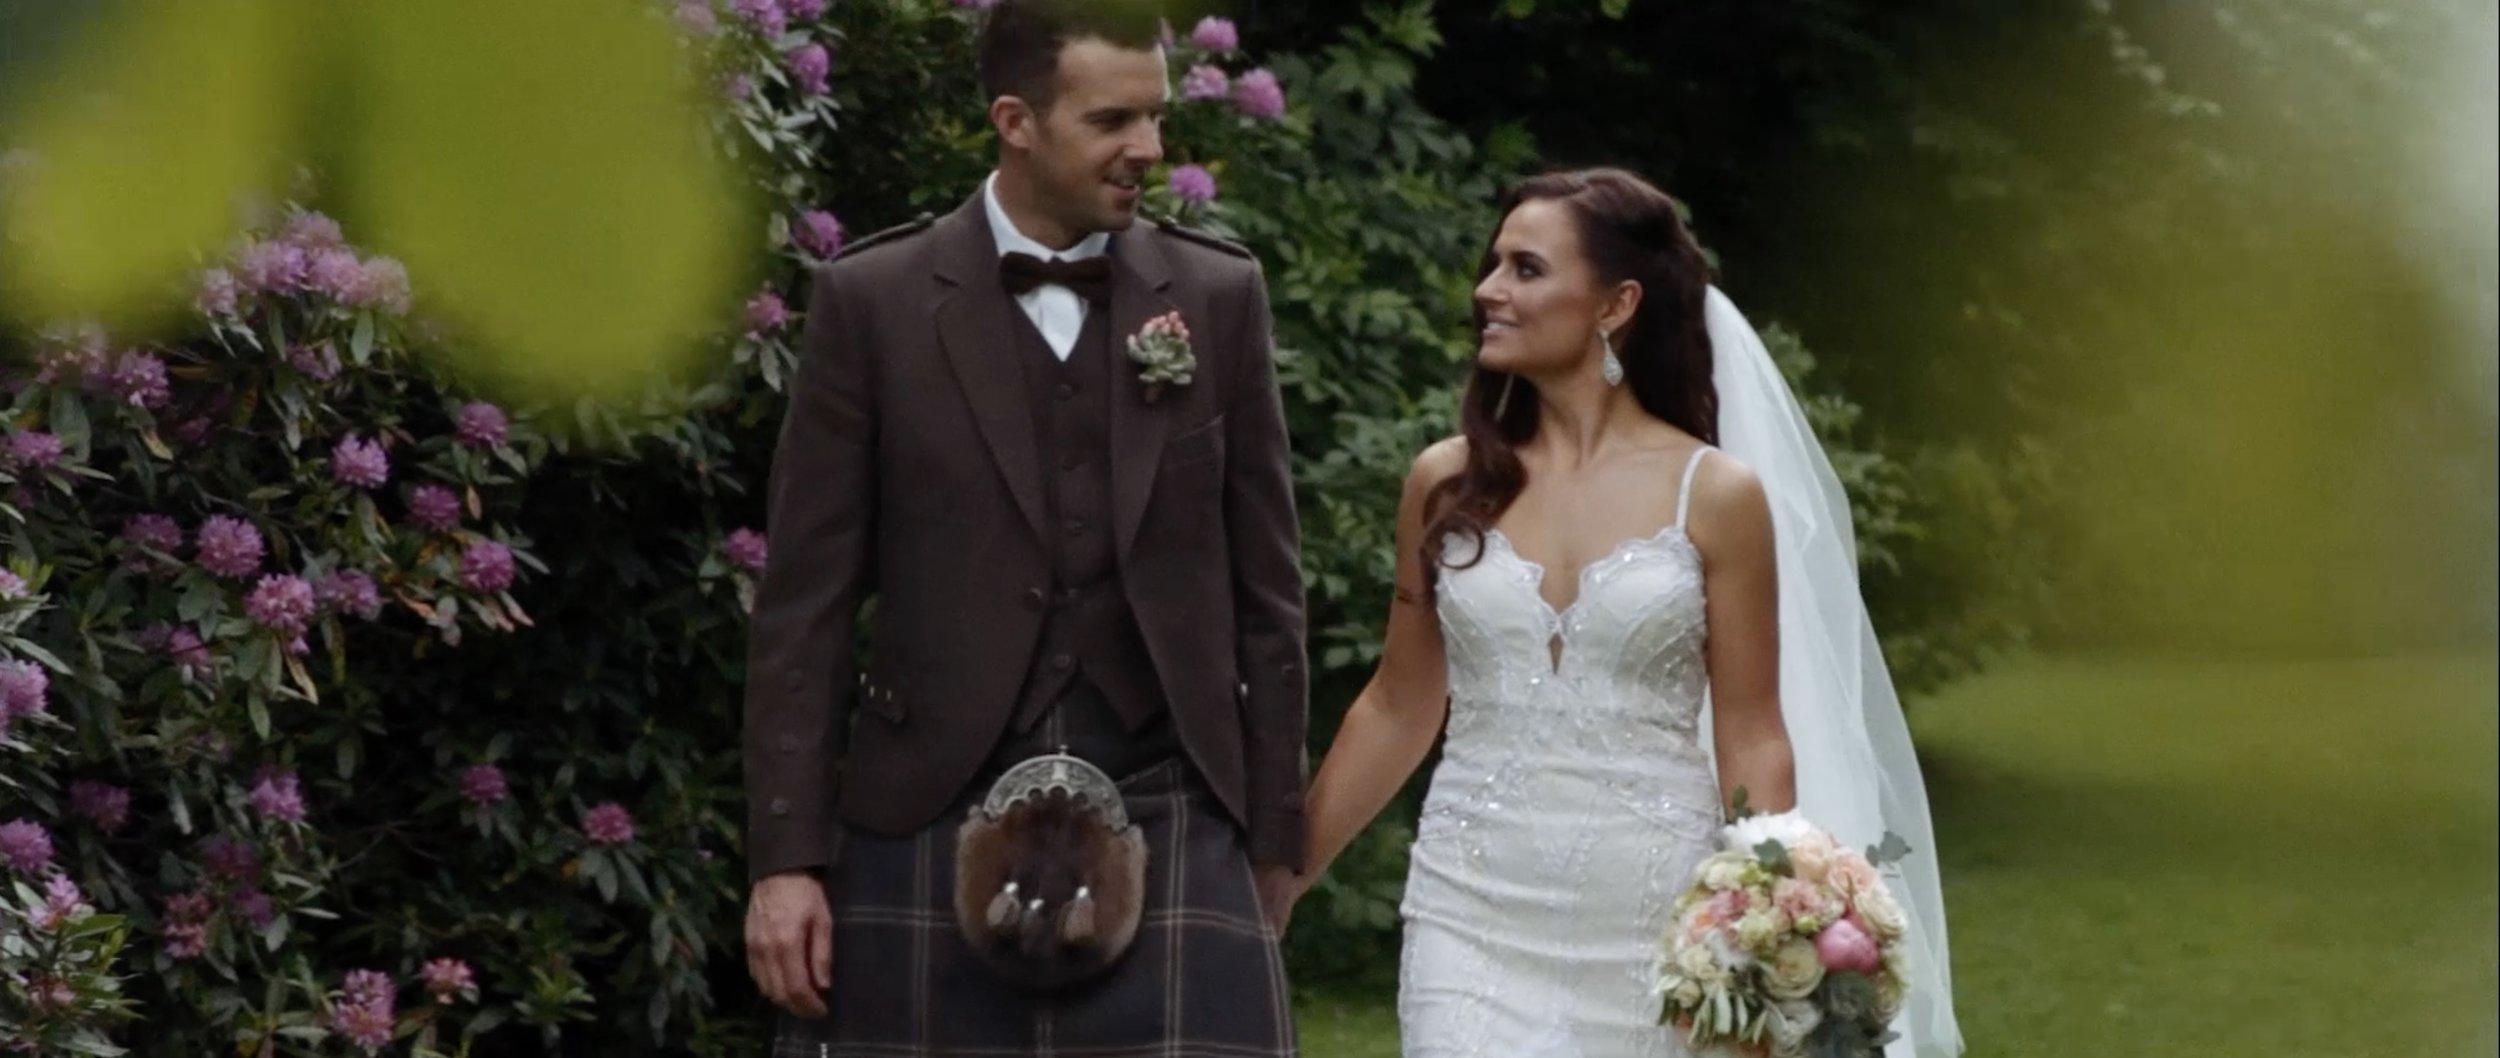 the-glue-factory-wedding-videographer_LL_06.jpg